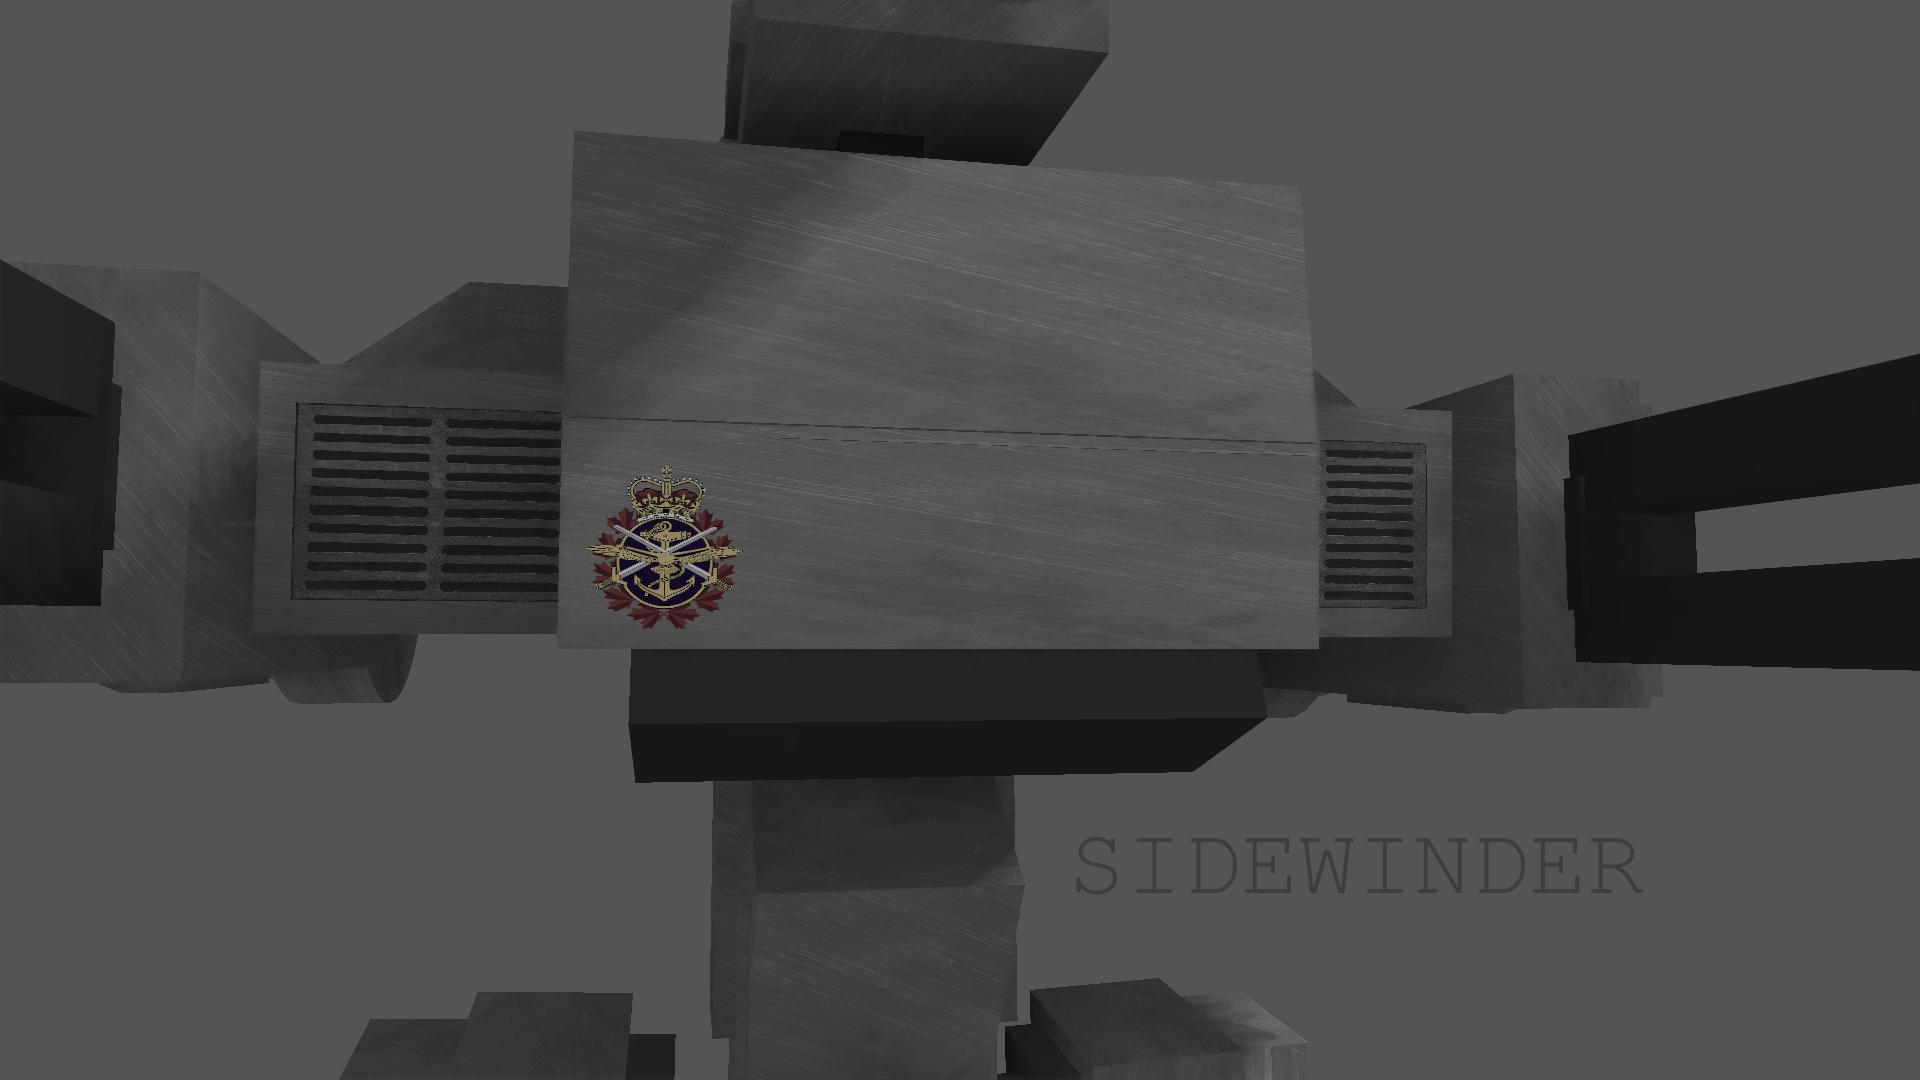 Image - Show-Off Mech 6 (Symbols).png | War Robots Wiki | FANDOM ...